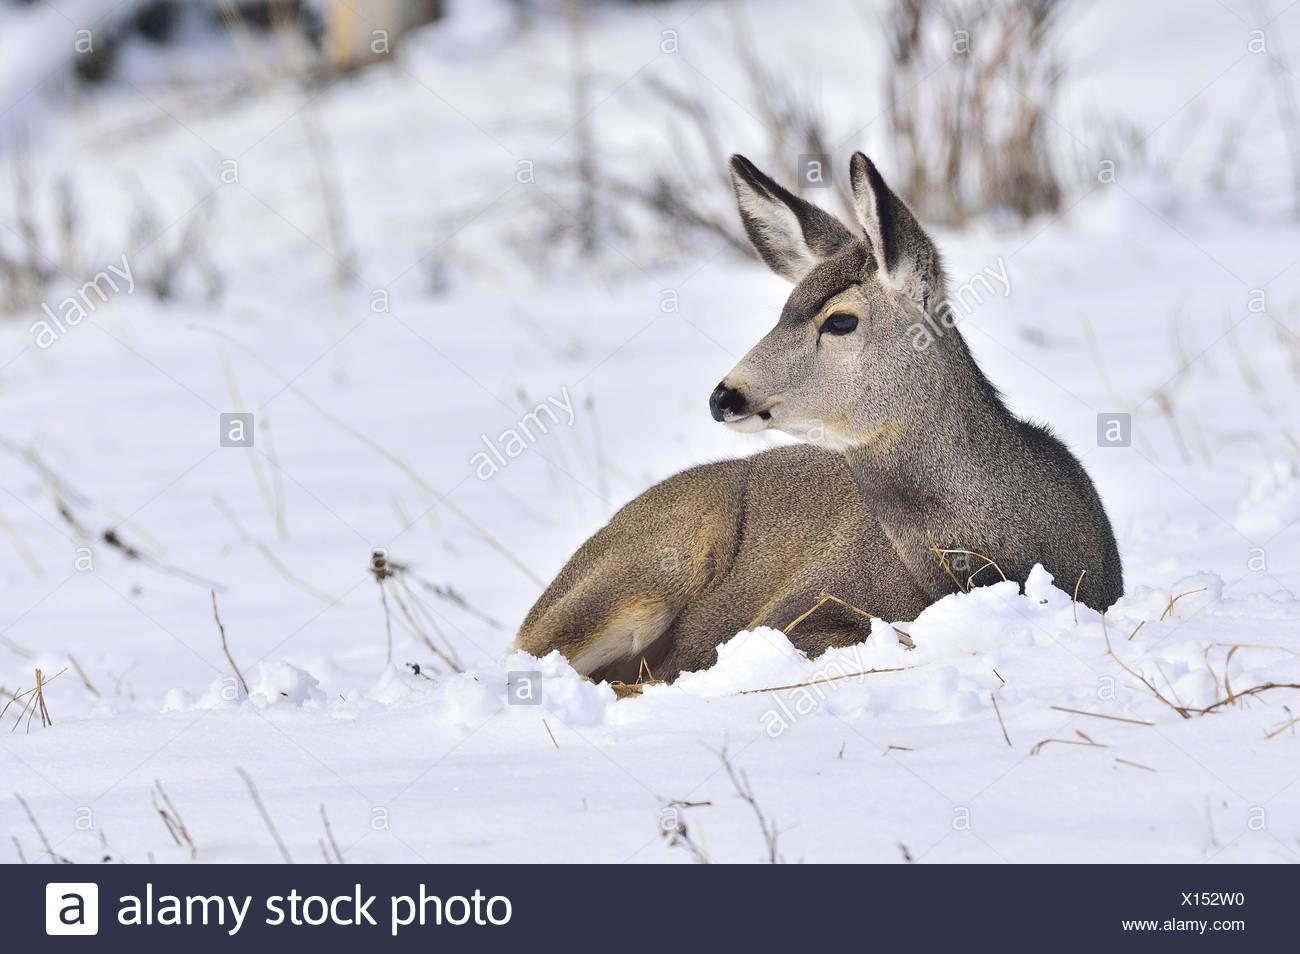 A female mule deer, Odocoileus hemionus, laying in the fresh snow in rural Alberta Canada Stock Photo